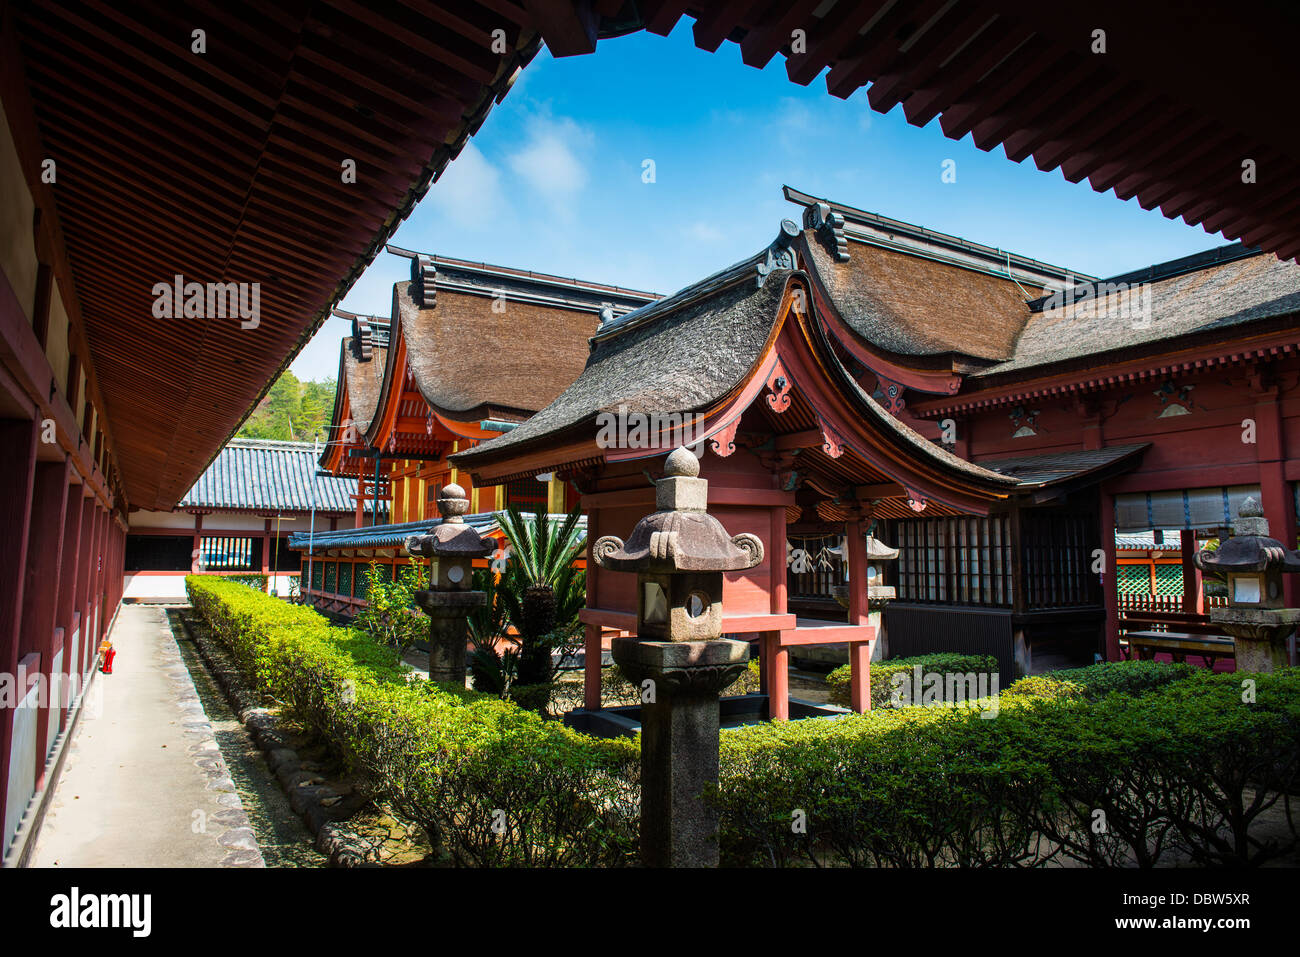 Ishiteji Temple à Matsuyama, Shikoku, Japon, Asie Photo Stock